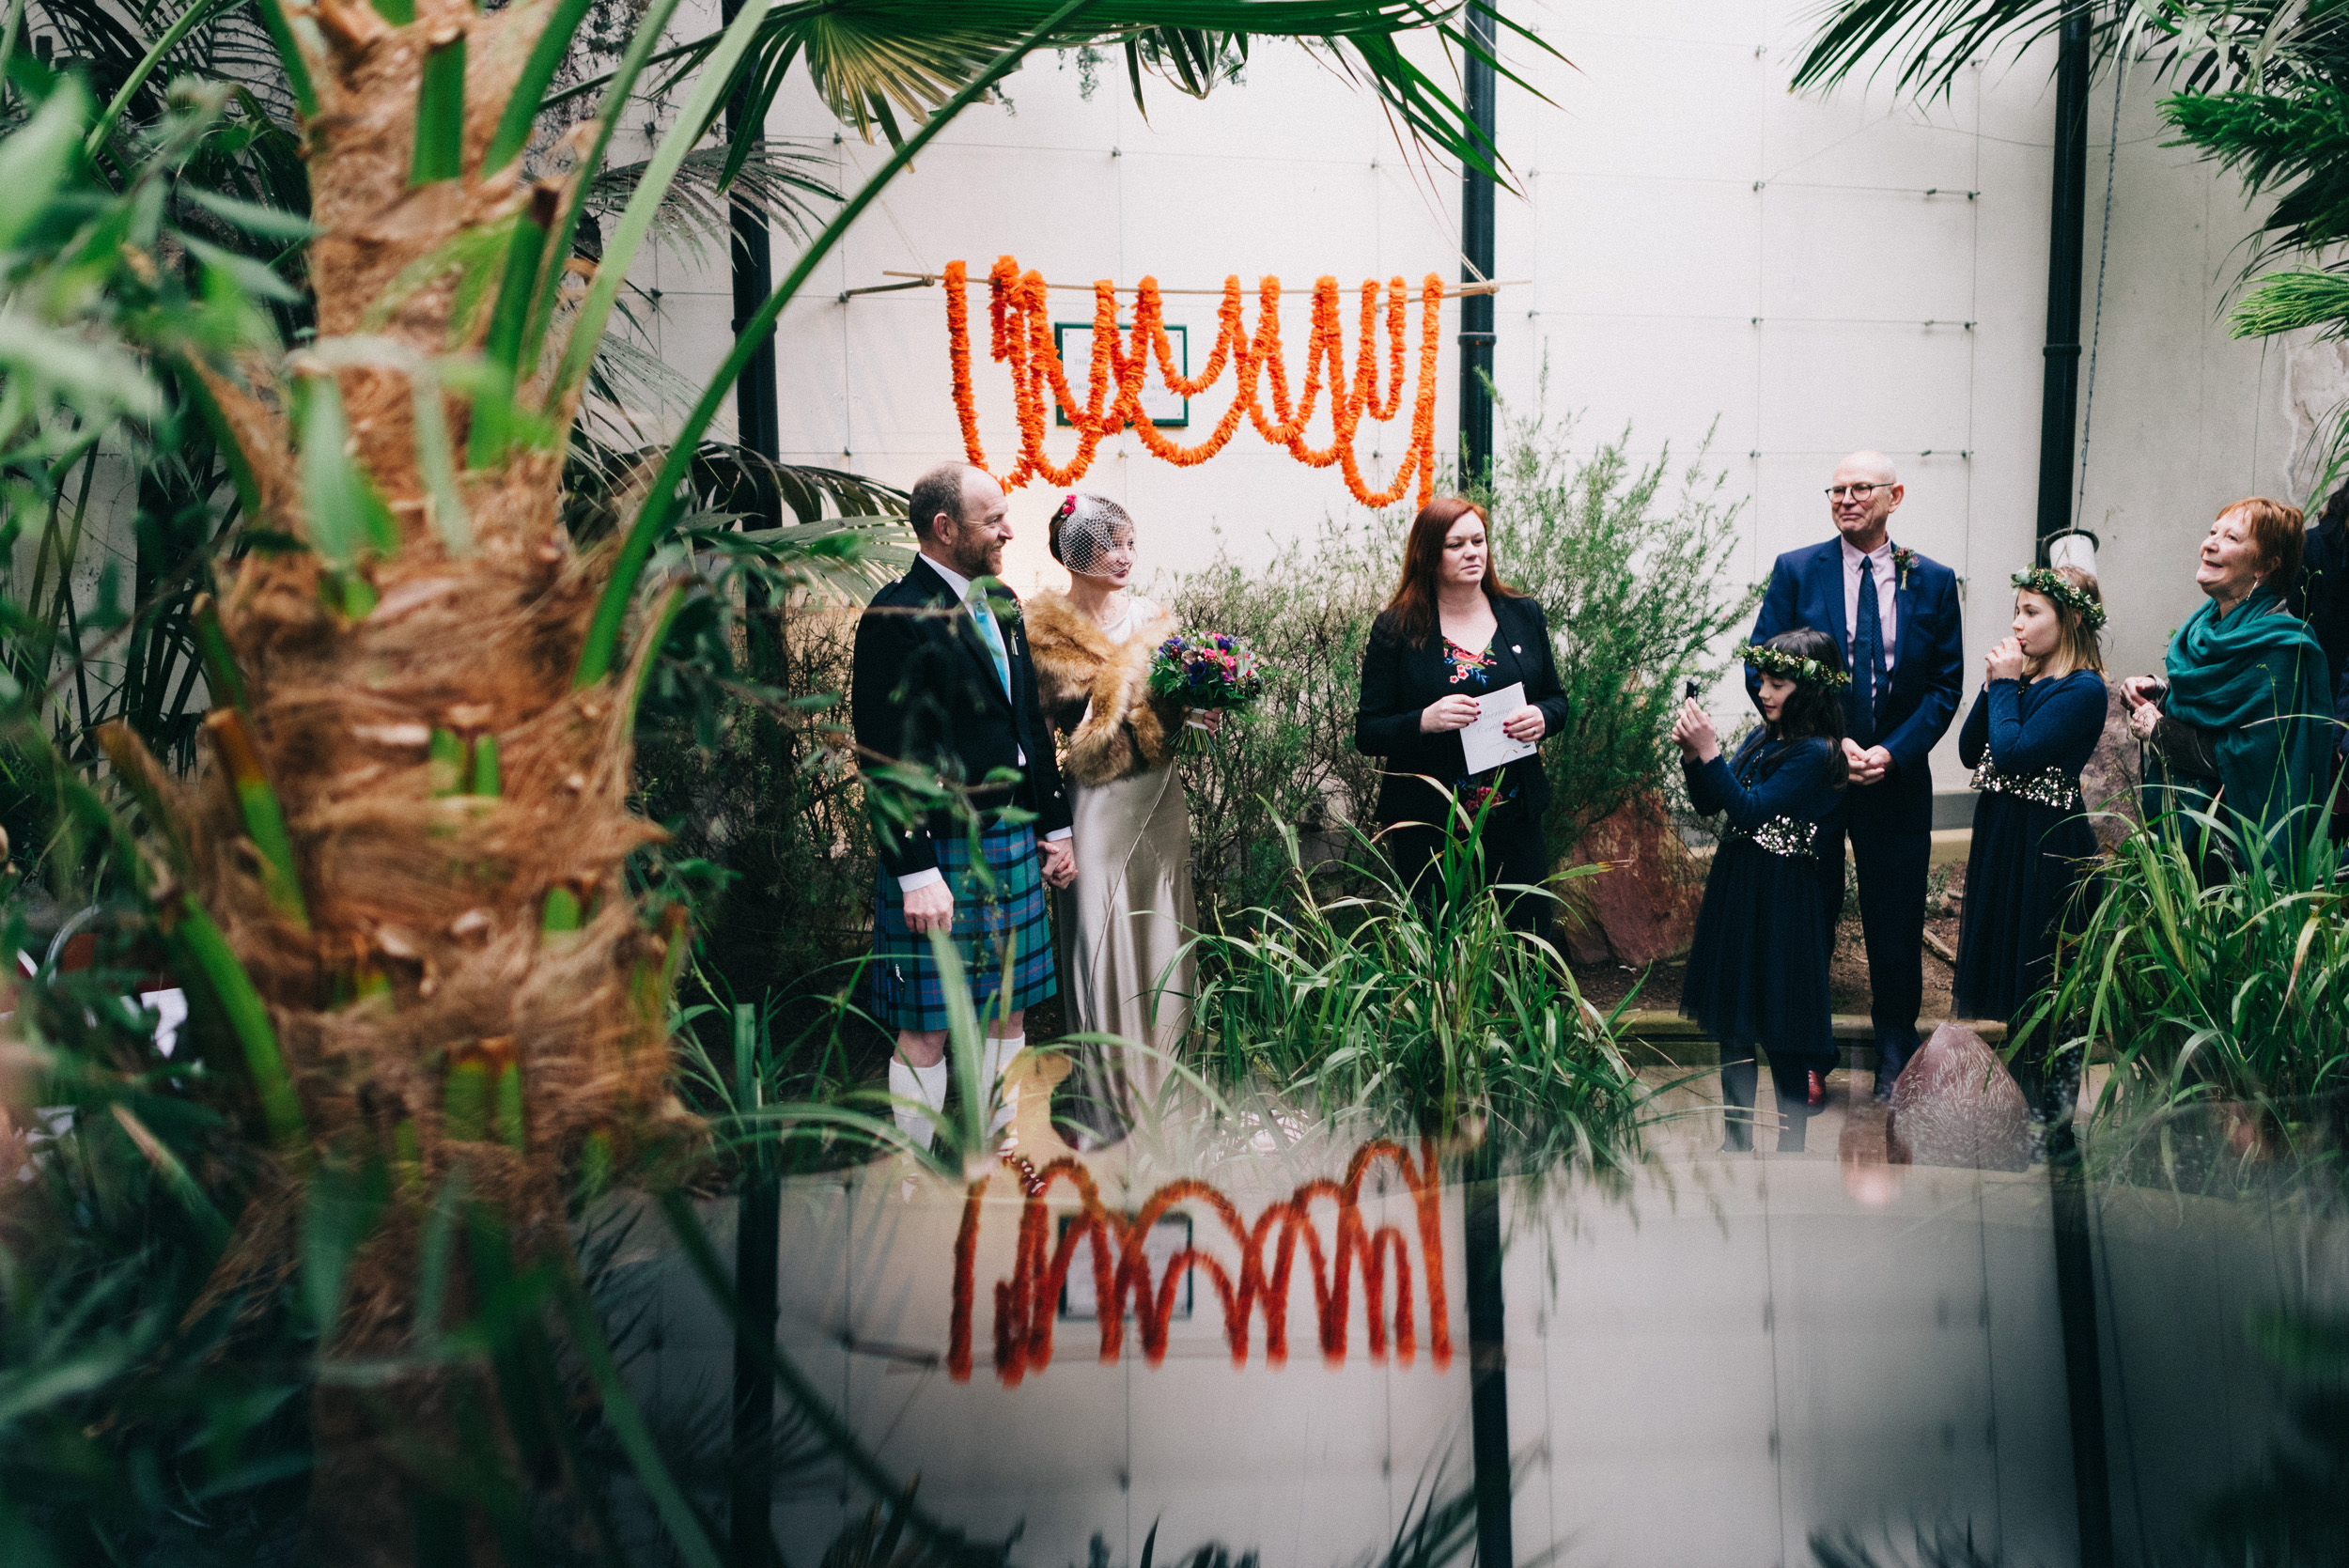 Alice-Bias-Cut-Silk-Wedding-Dress-Kate-Beaumont-Sheffield-Botanical-Gardens-by-Peakography-13.jpg